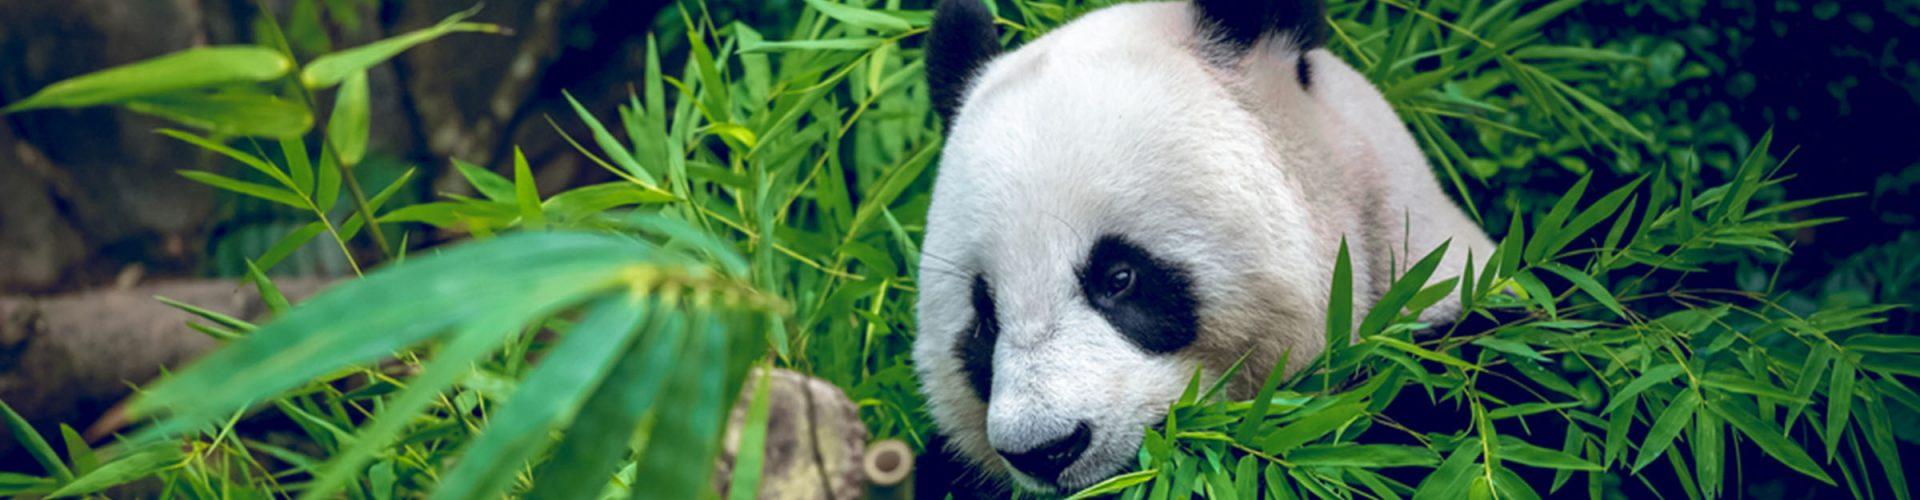 A Giand Panda eating bamboo